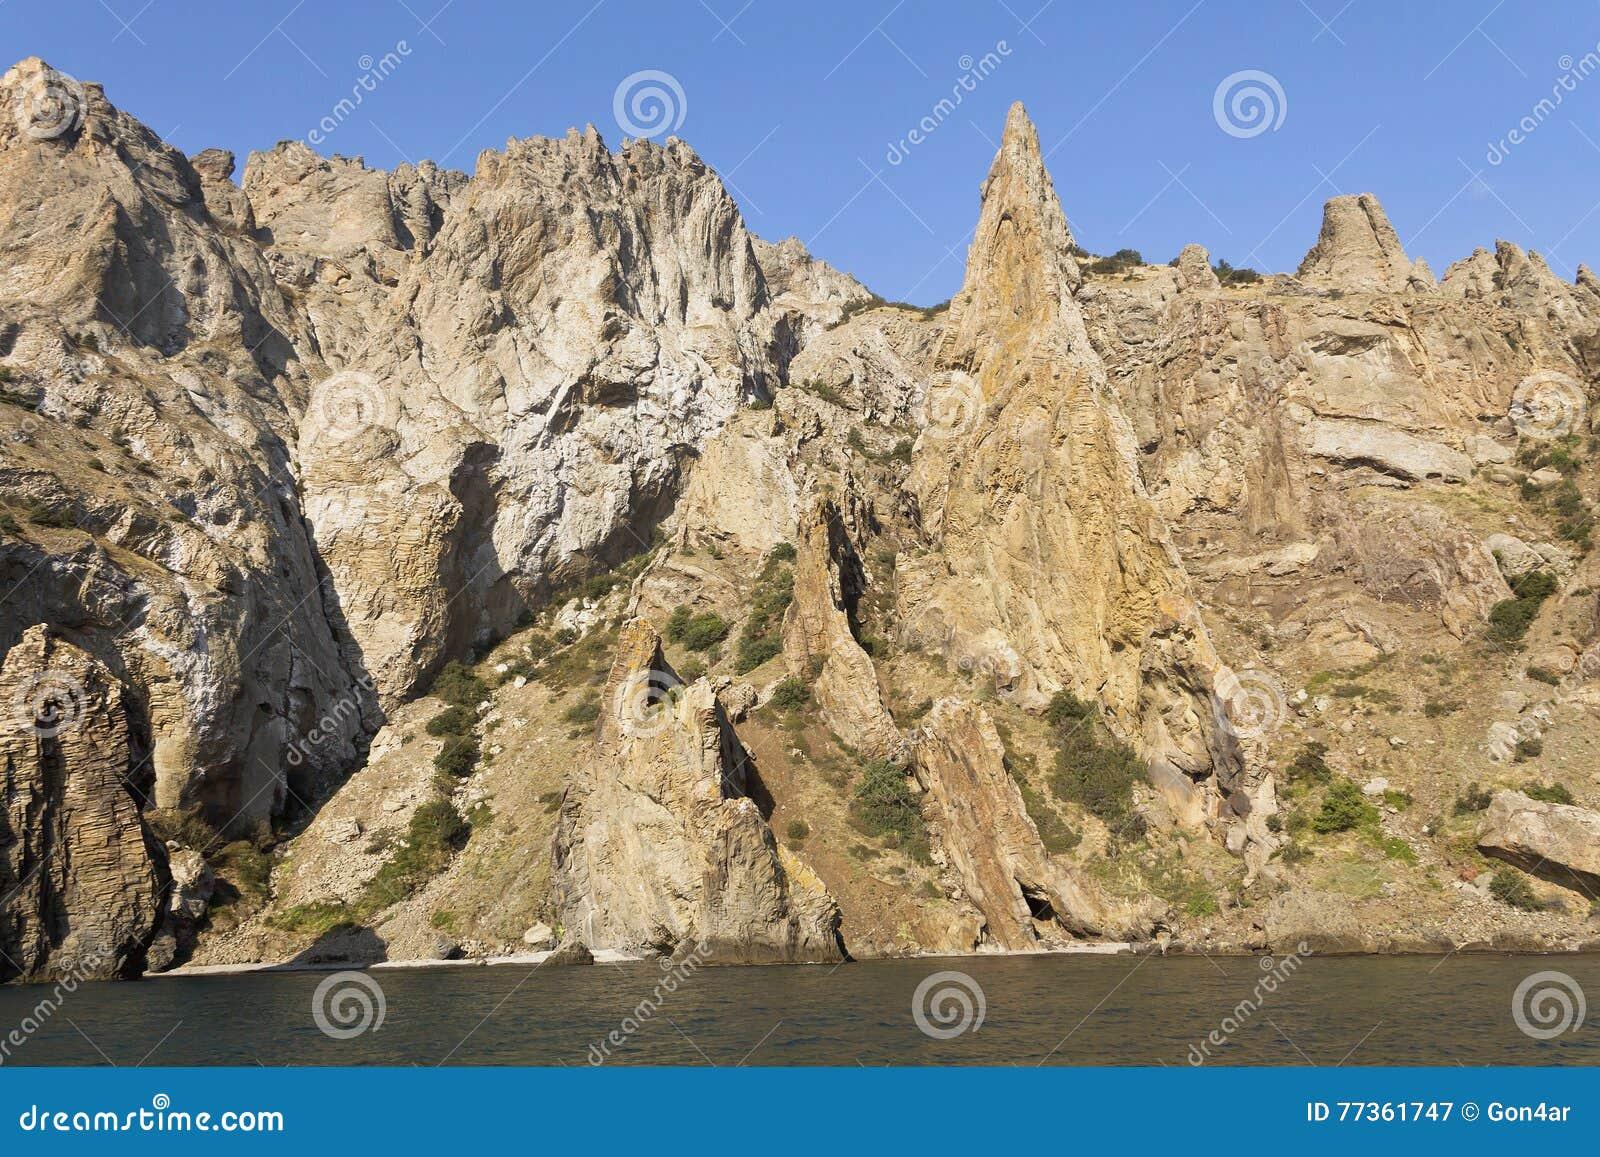 Bizarre rocks of Kara-Dag.On the coast of the Black sea.